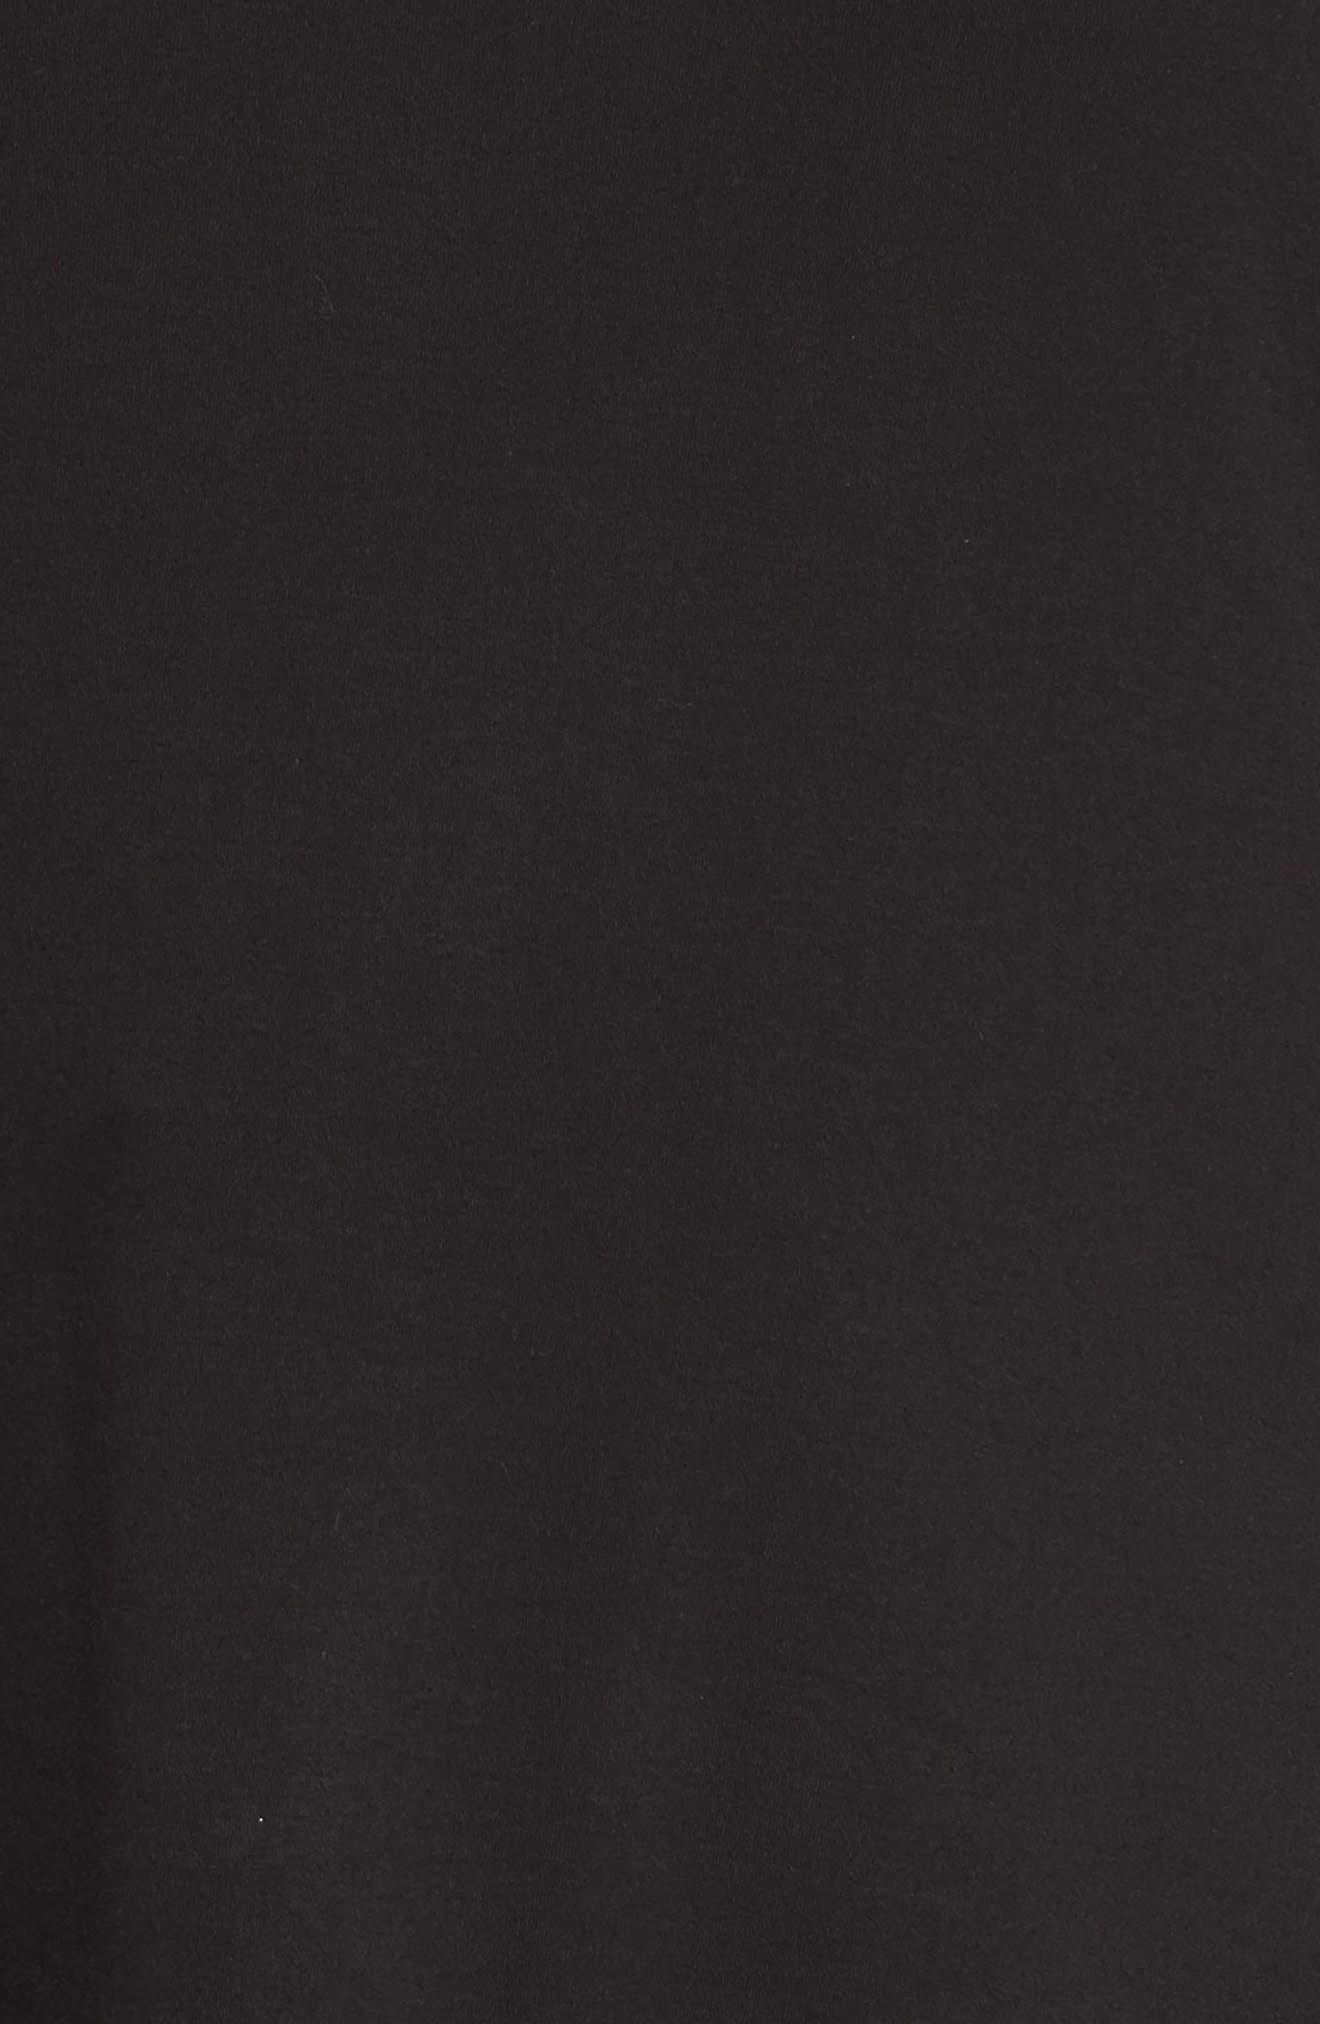 Pleat Ruffle Sleeve Top,                             Alternate thumbnail 5, color,                             001